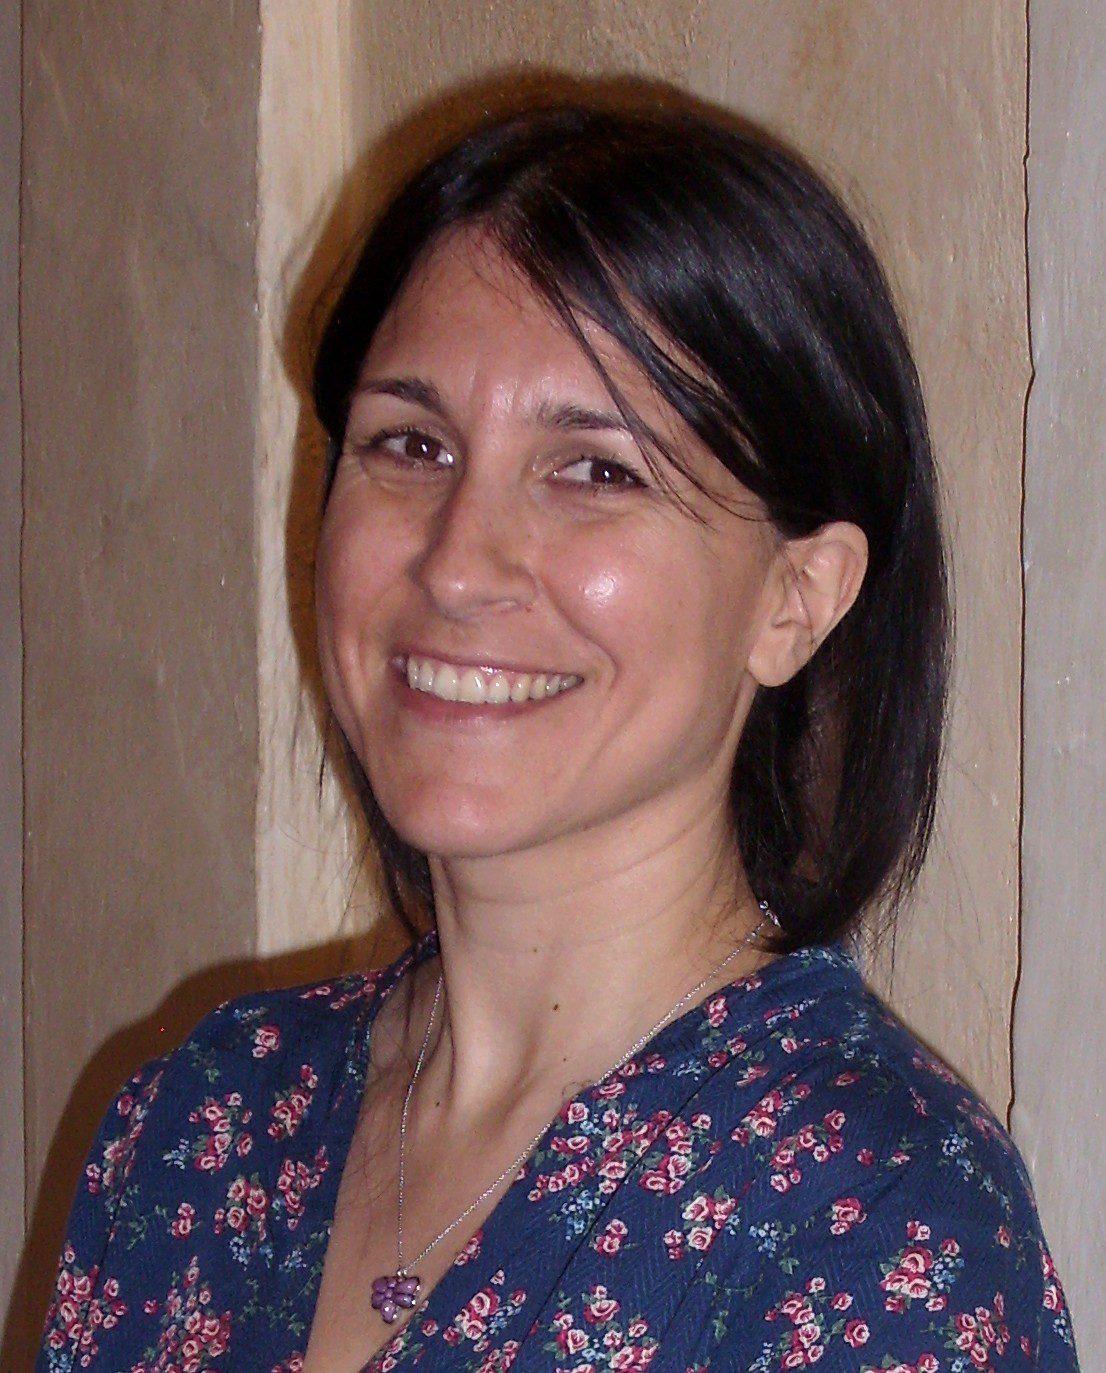 Paola Toriggia